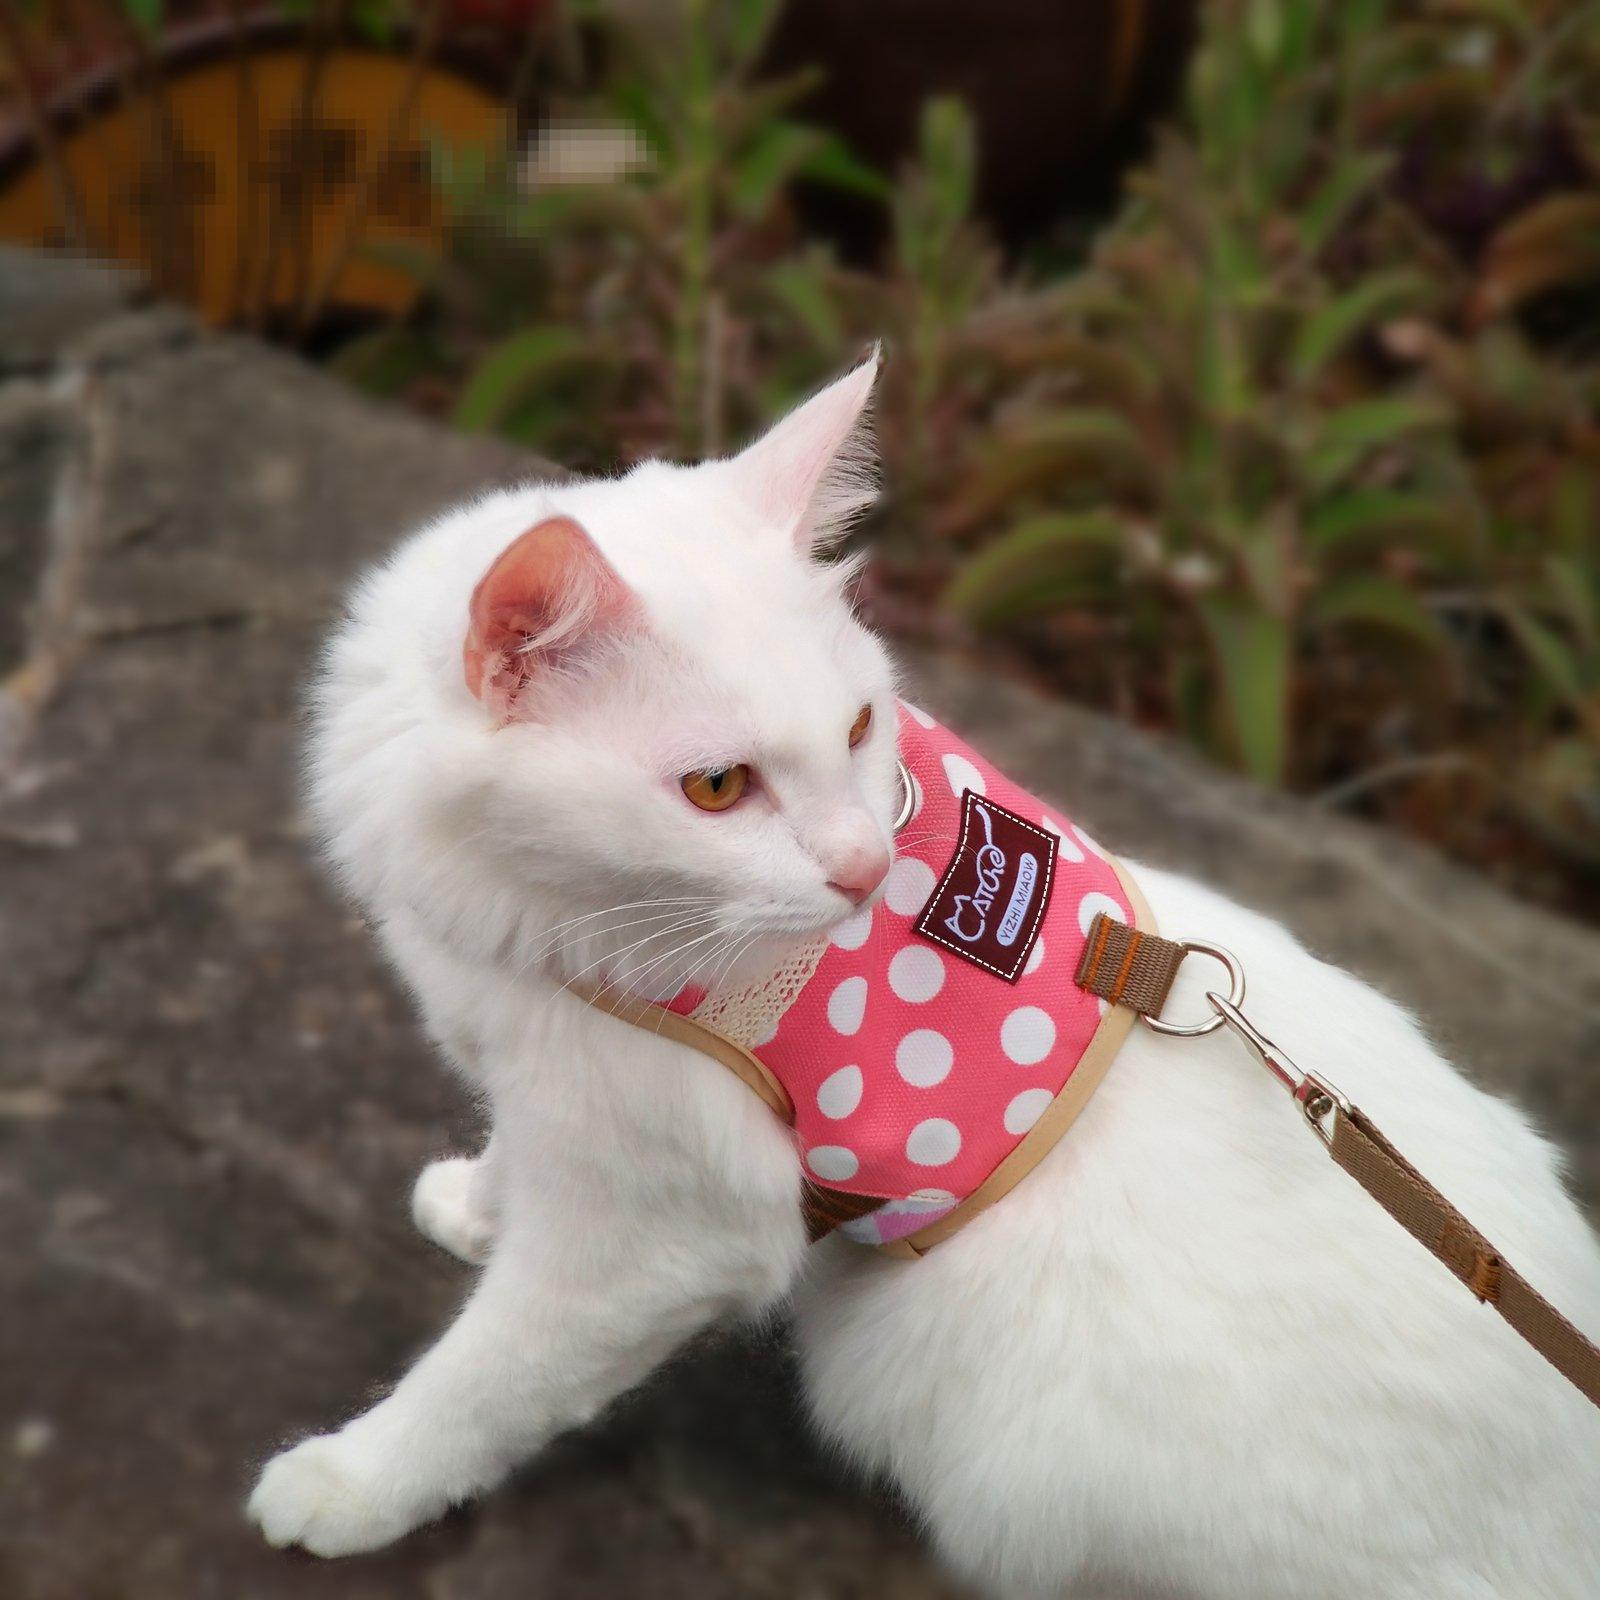 Yizhi Miaow Adjustbale Kitten/Ferret Walking Jackets Padded Vest Cat Harness and Leash X-Small, Cat/Dog Harness and Leash for Walking Escape Proof